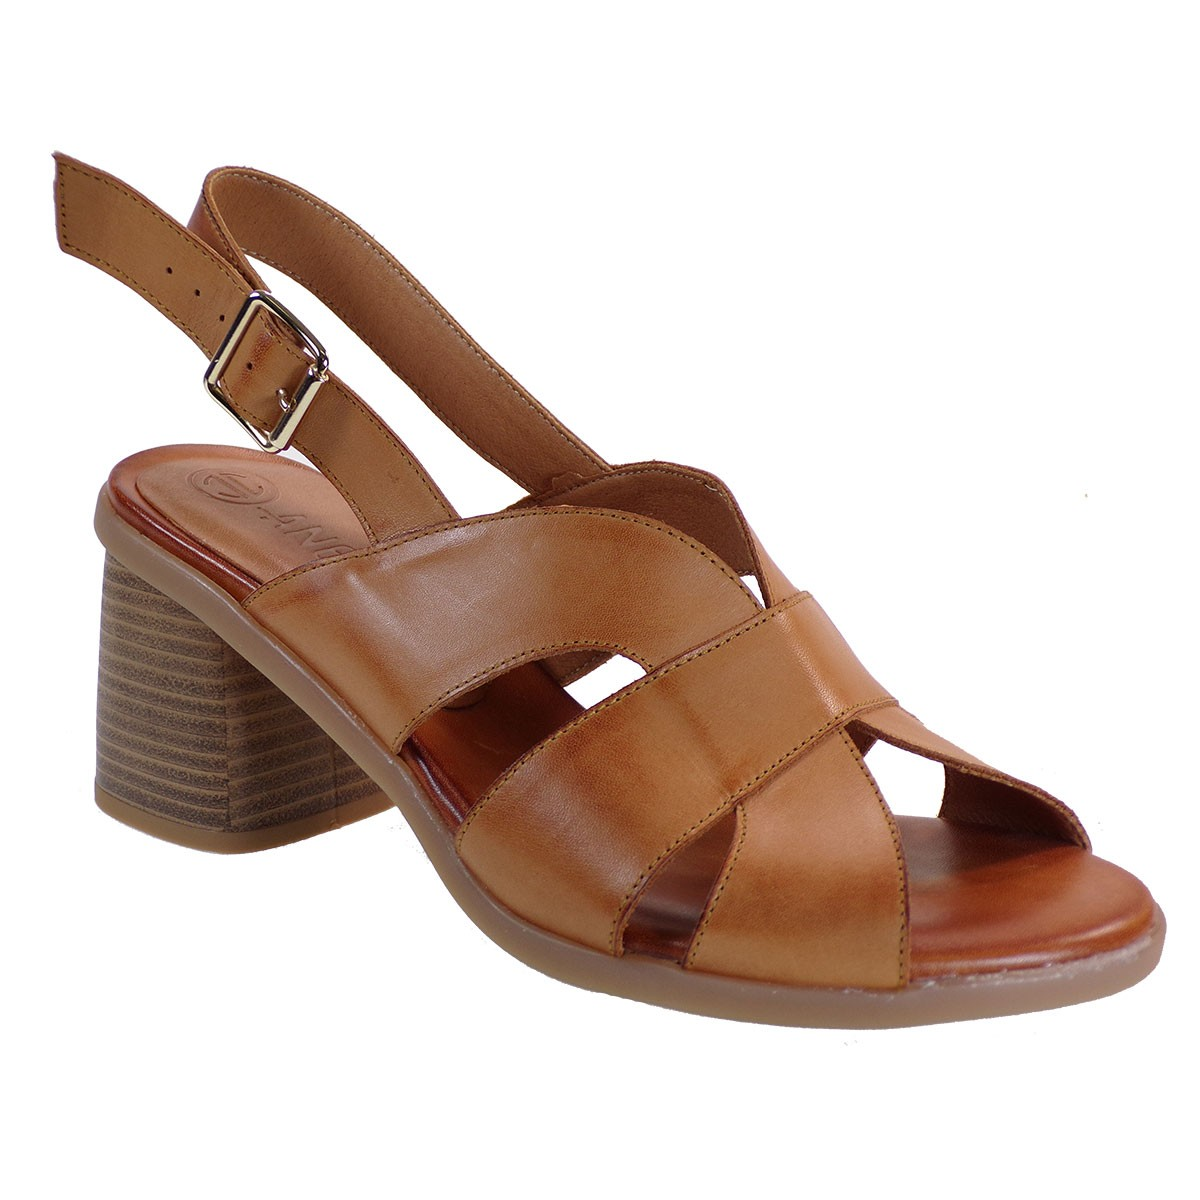 Katia Shoes Anneto Γυναικεία Πέδιλα Κ30-3722 Ταμπά Δέρμα